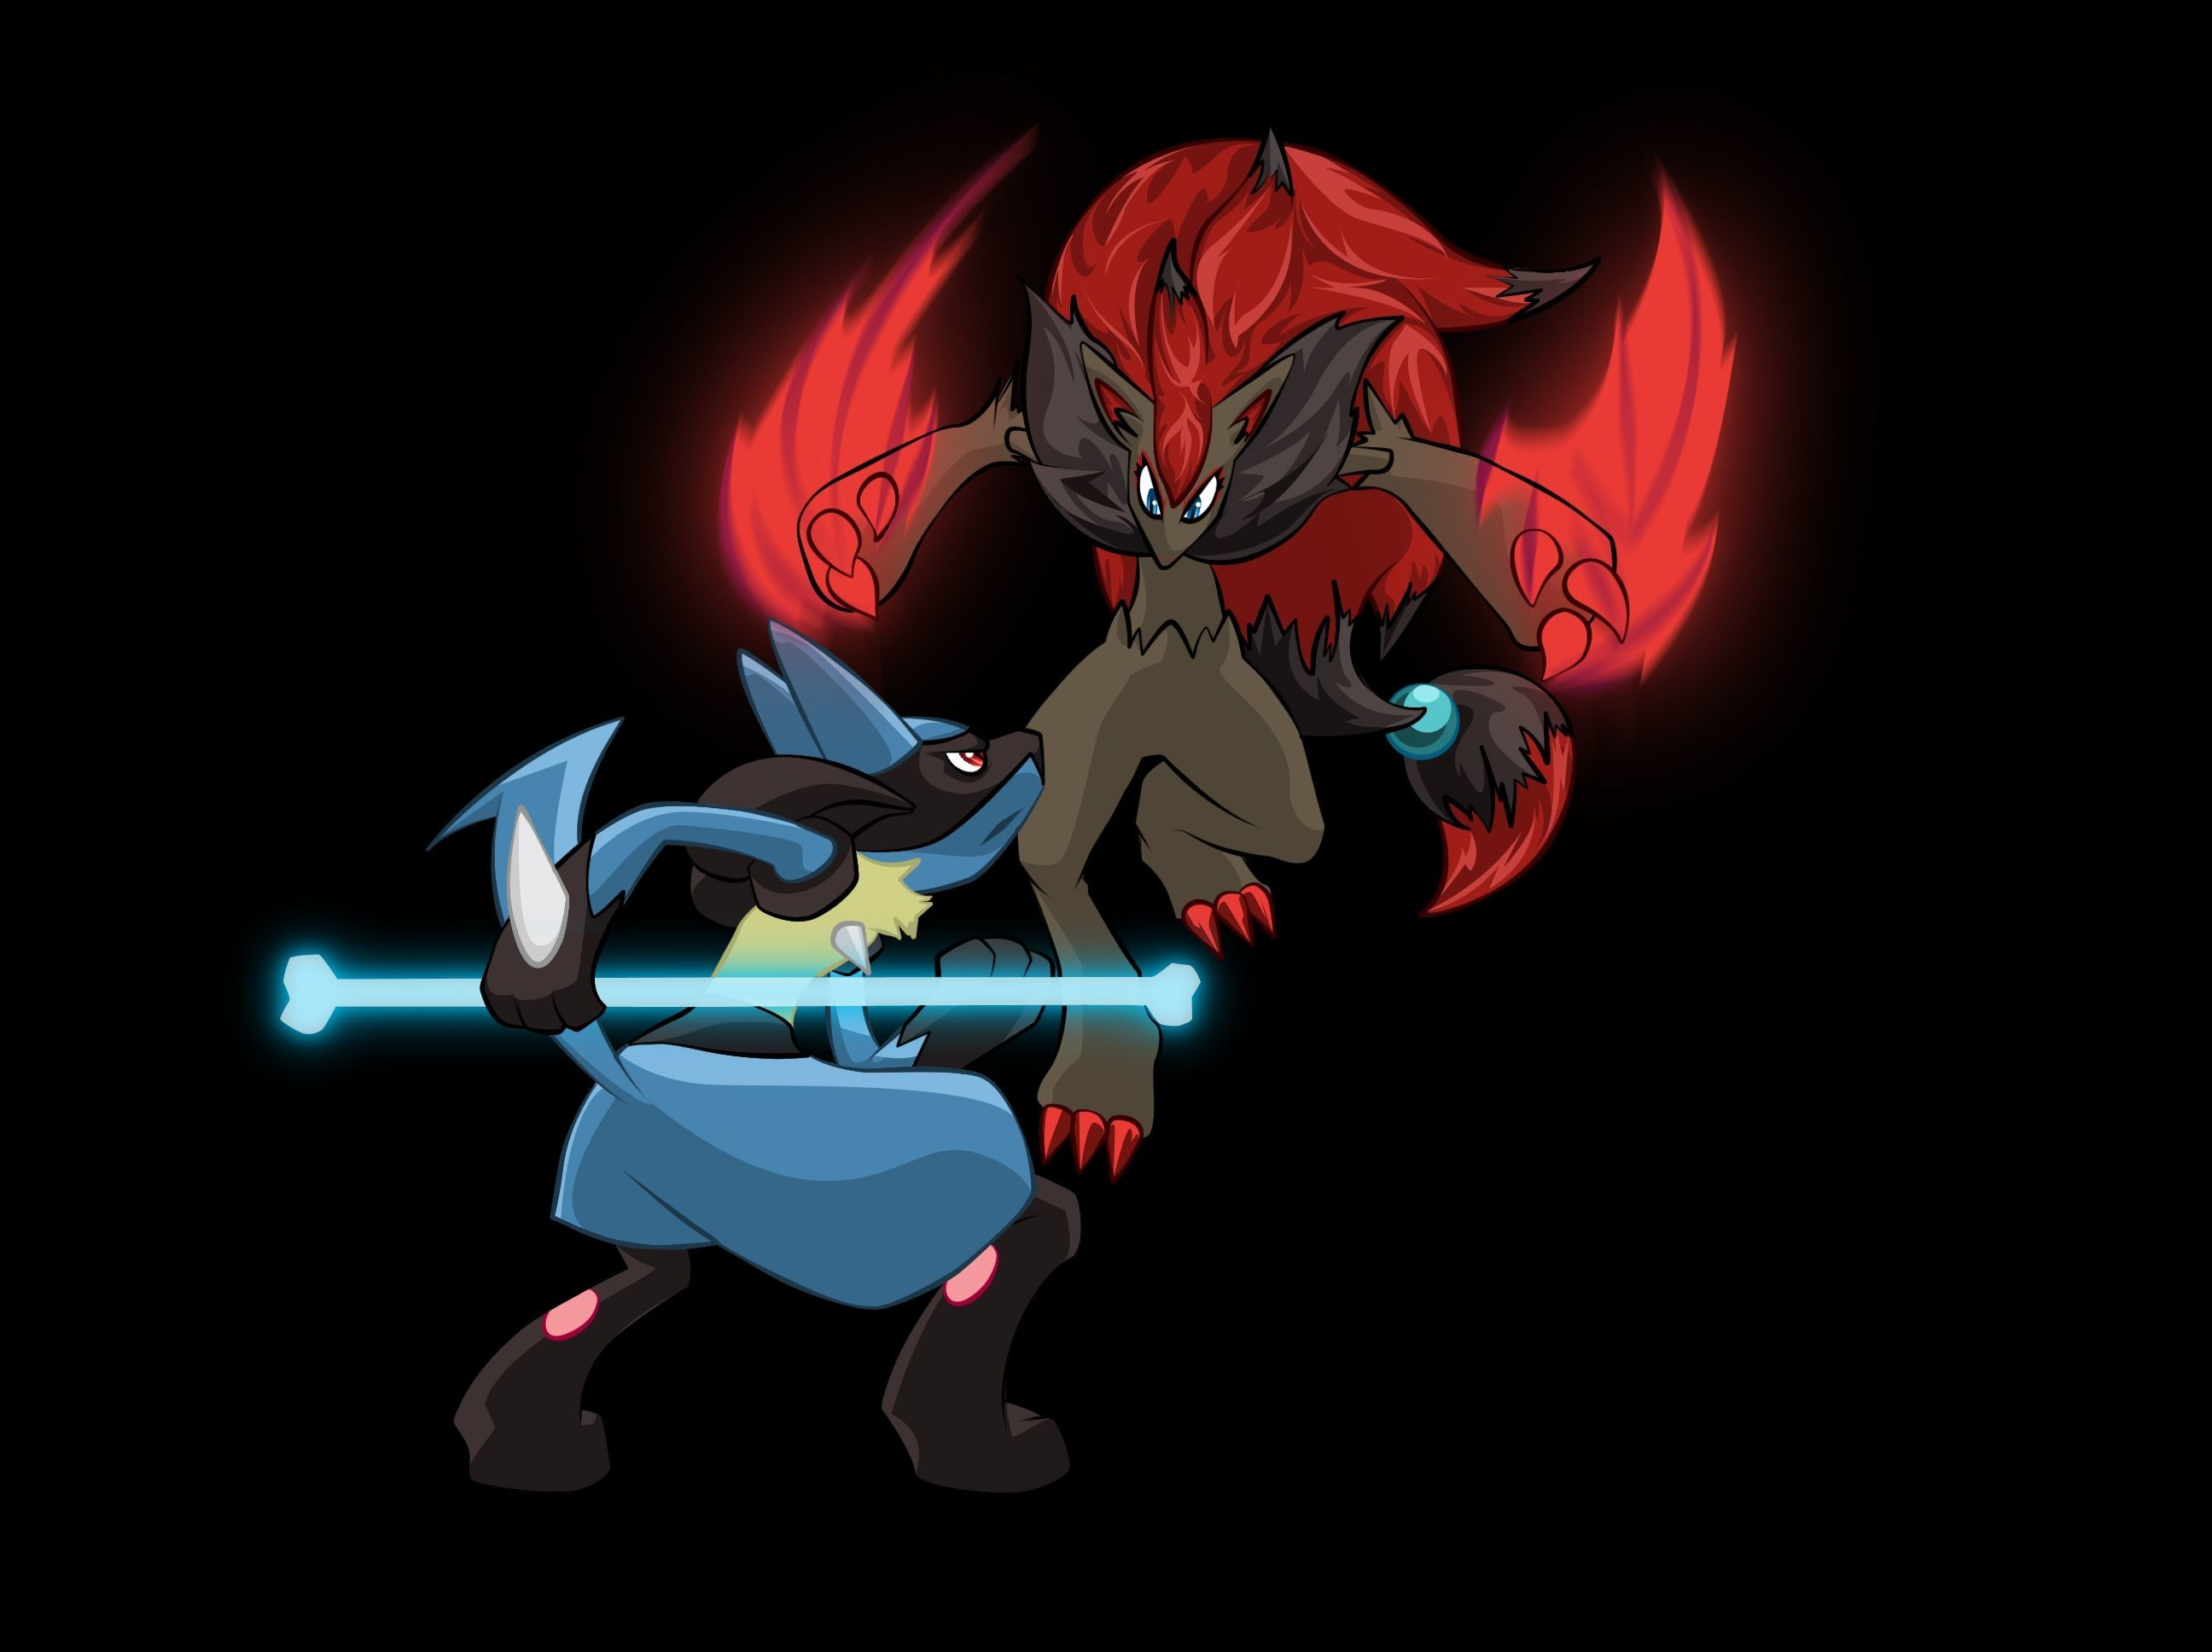 Res: 2592x1936, 1920x1200 HD Pokemon Lucario Image.